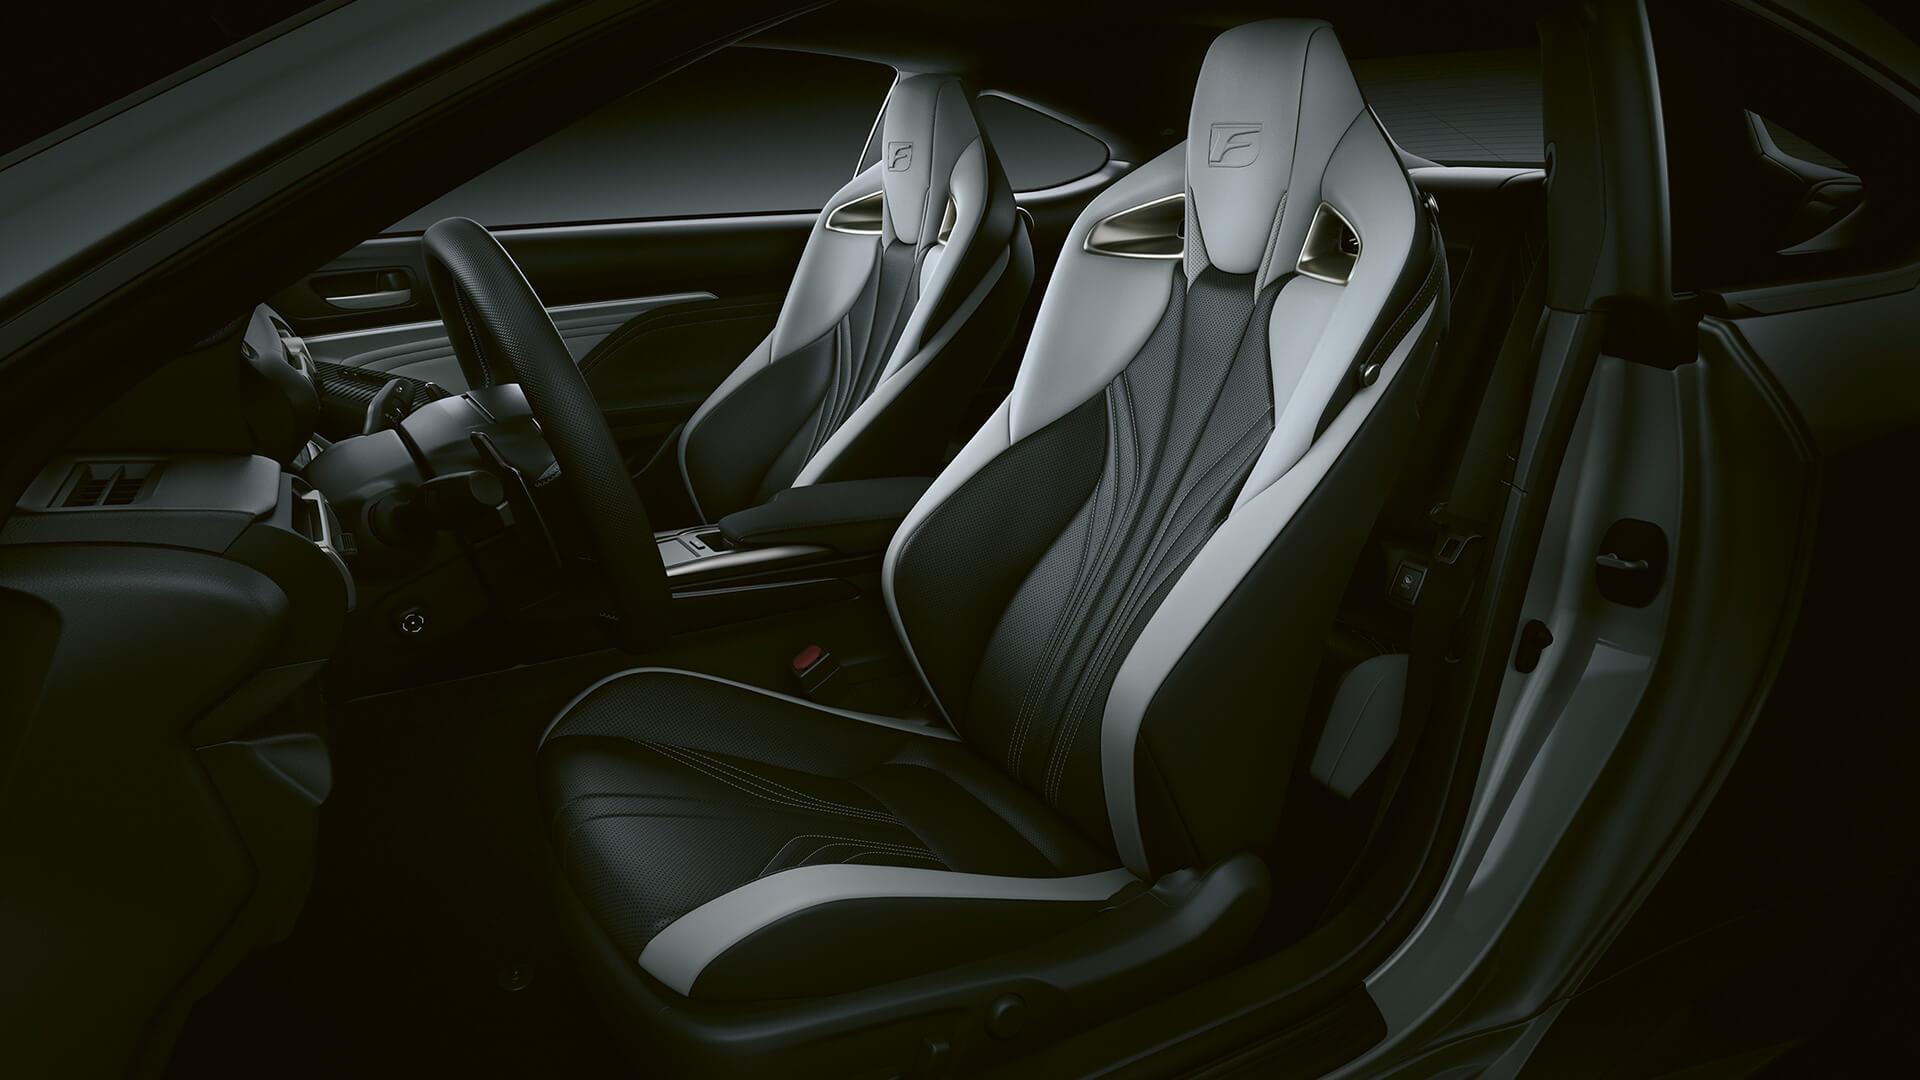 hotspot 1920x1080 leather sports seats